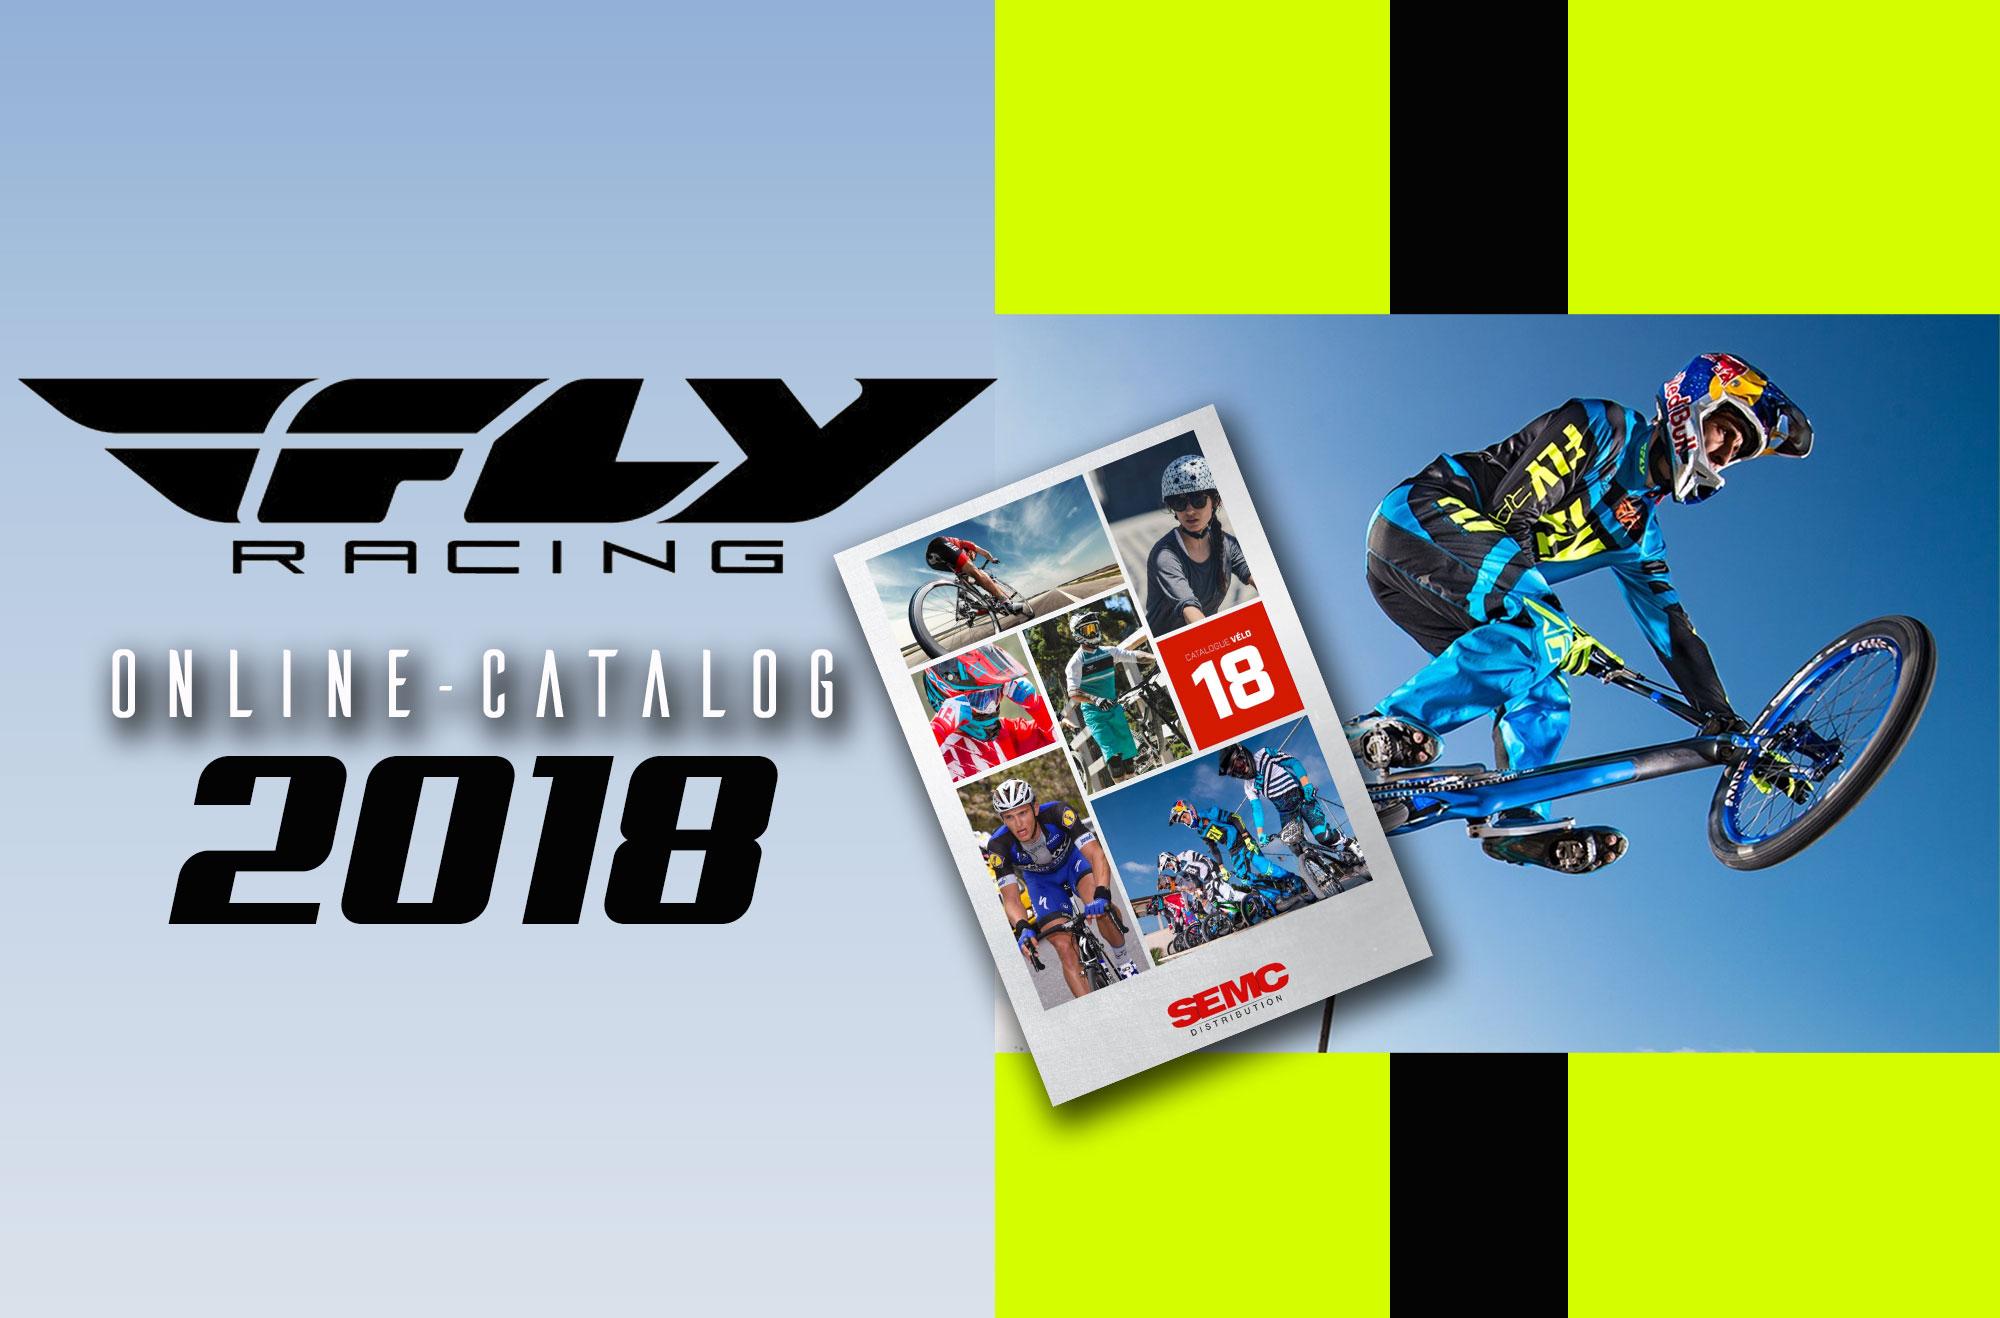 fabmx1 catalogue semc fly racing 2018. Black Bedroom Furniture Sets. Home Design Ideas